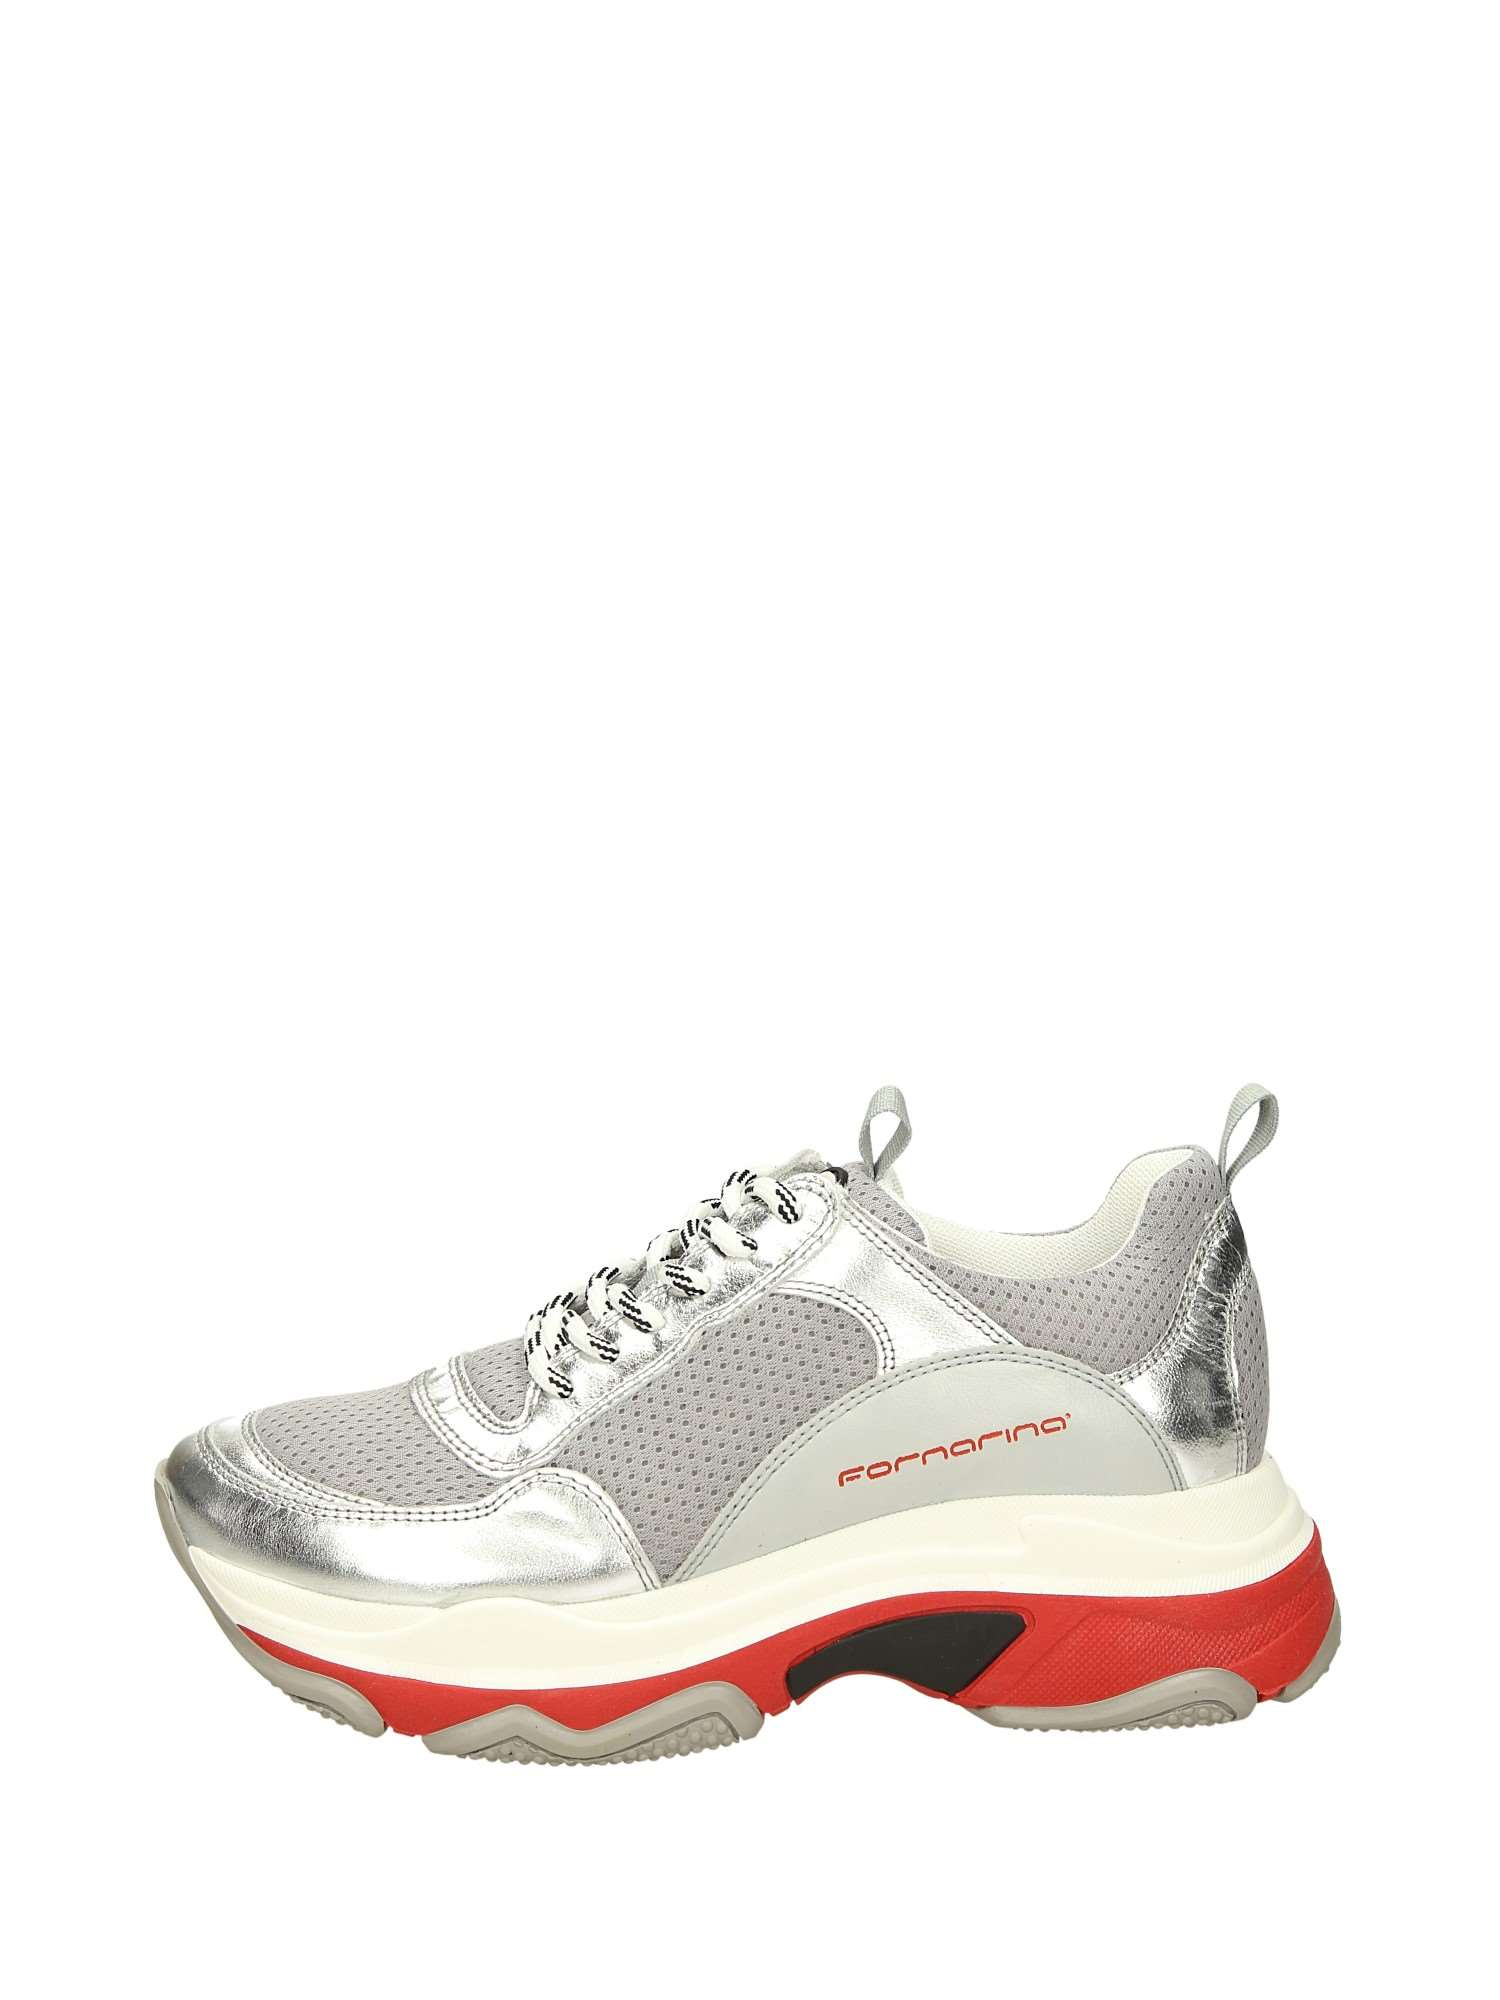 Fornarina DPI19SUPER30 Argento Scarpe Donna Sneakers c2c1eef800a